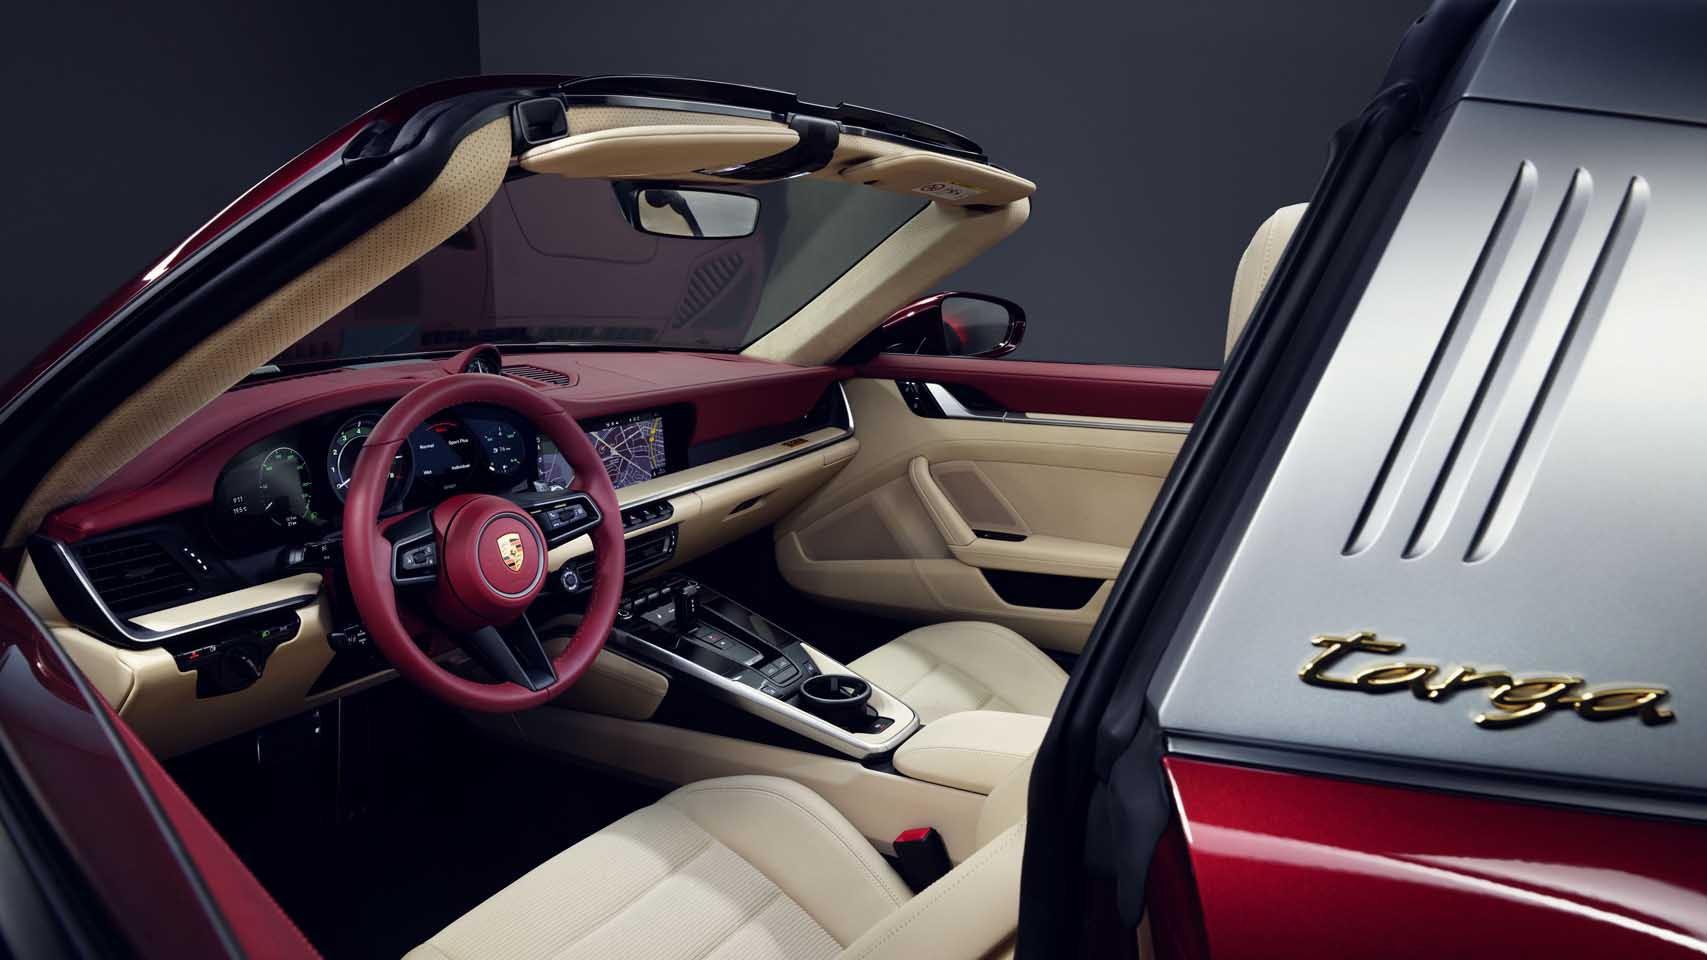 2021 Porsche 911 Targa 4S Heritage Design